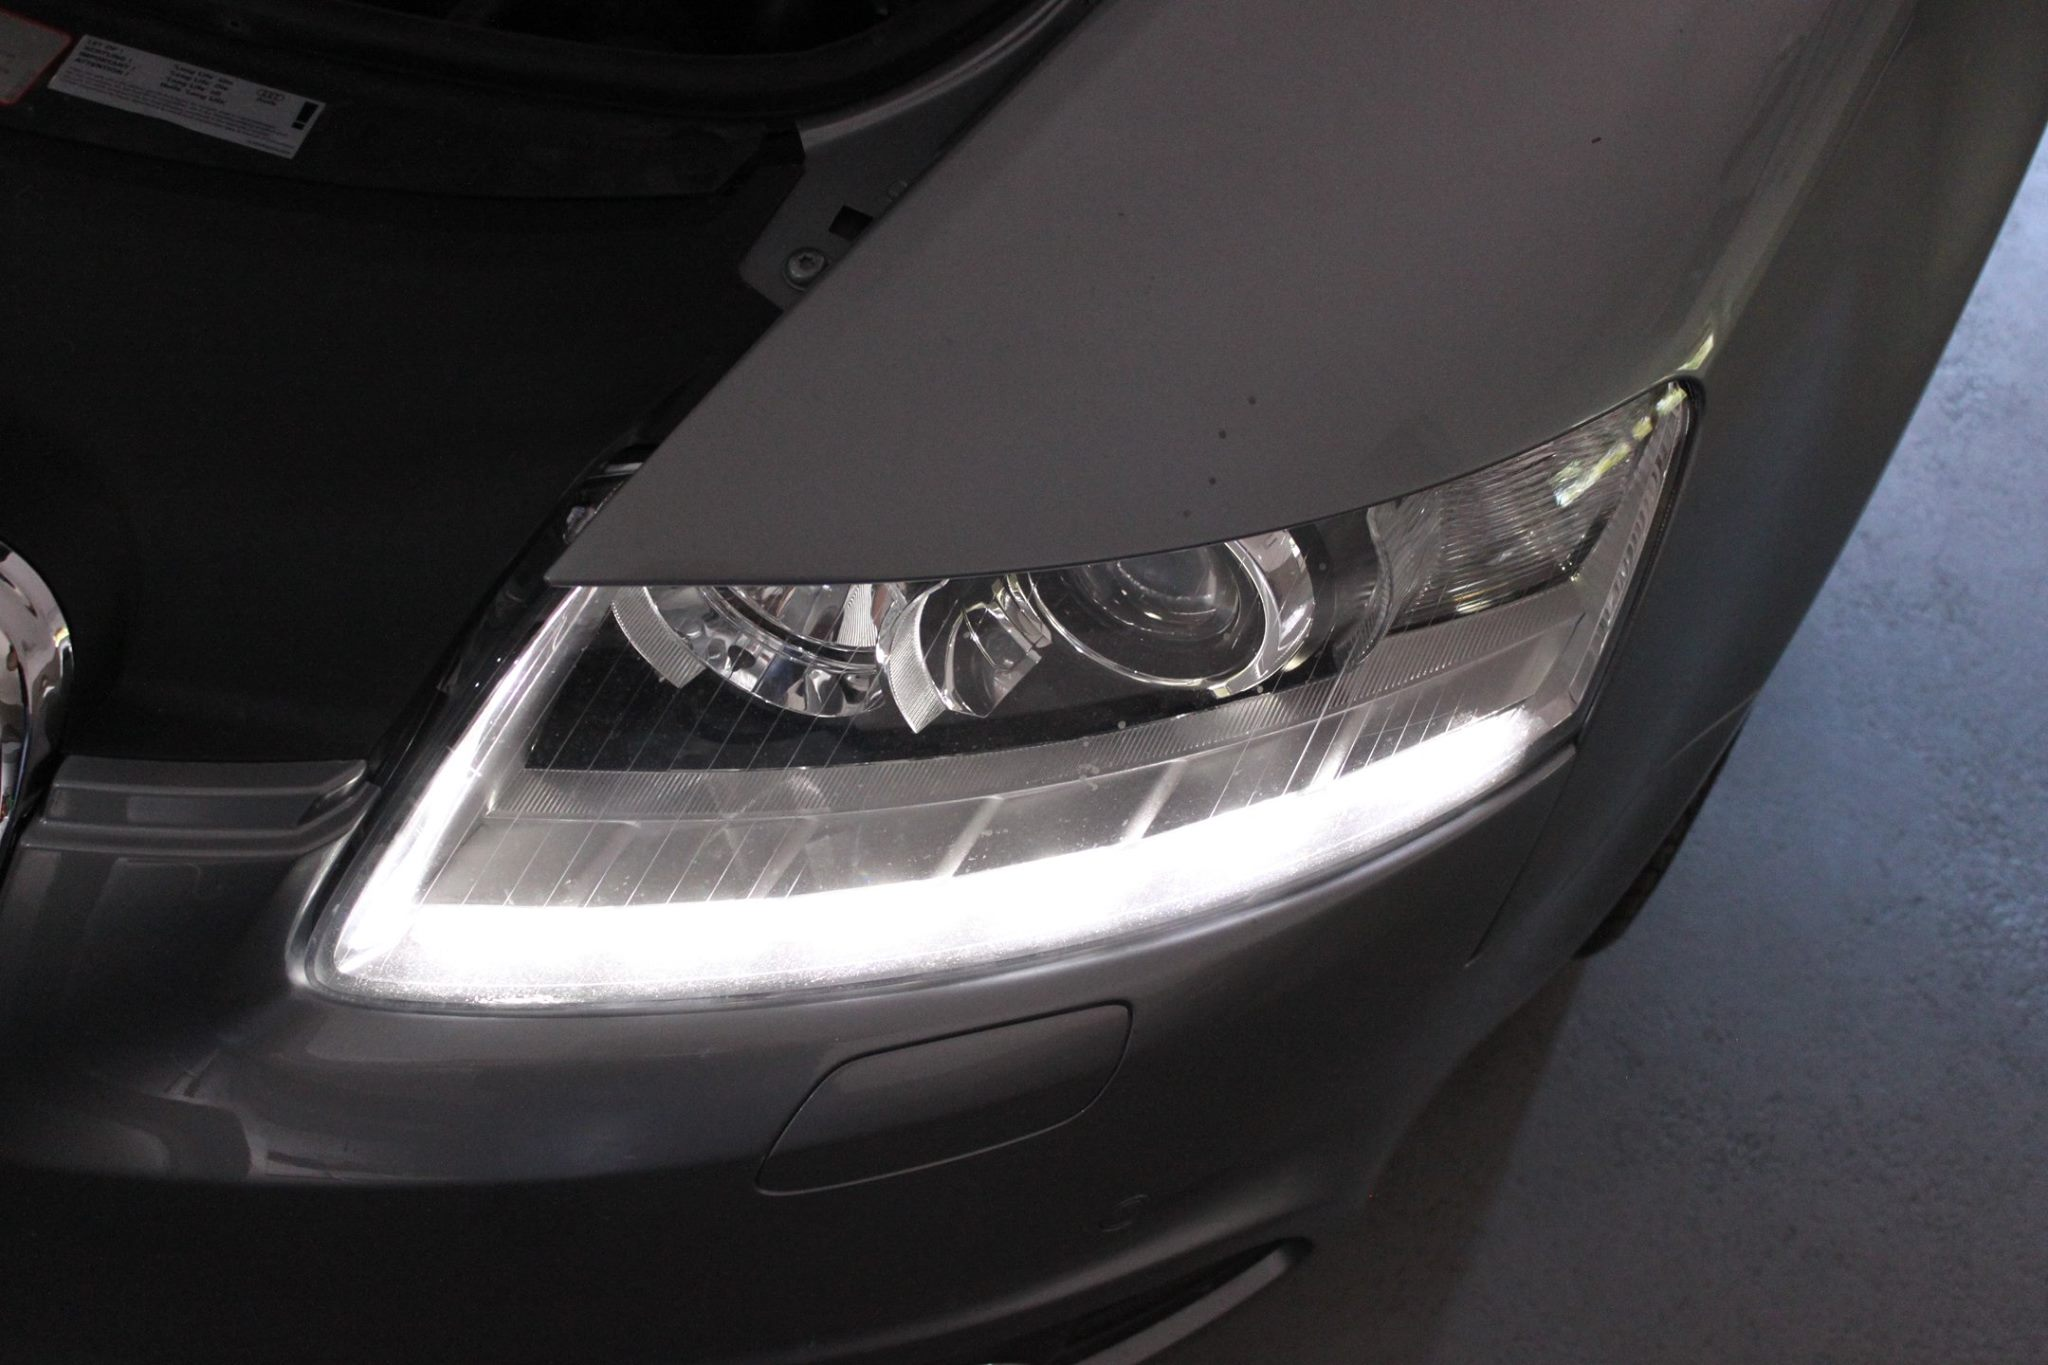 AUDI A6 C6 POLIFT 2011 3.0 TDI V6